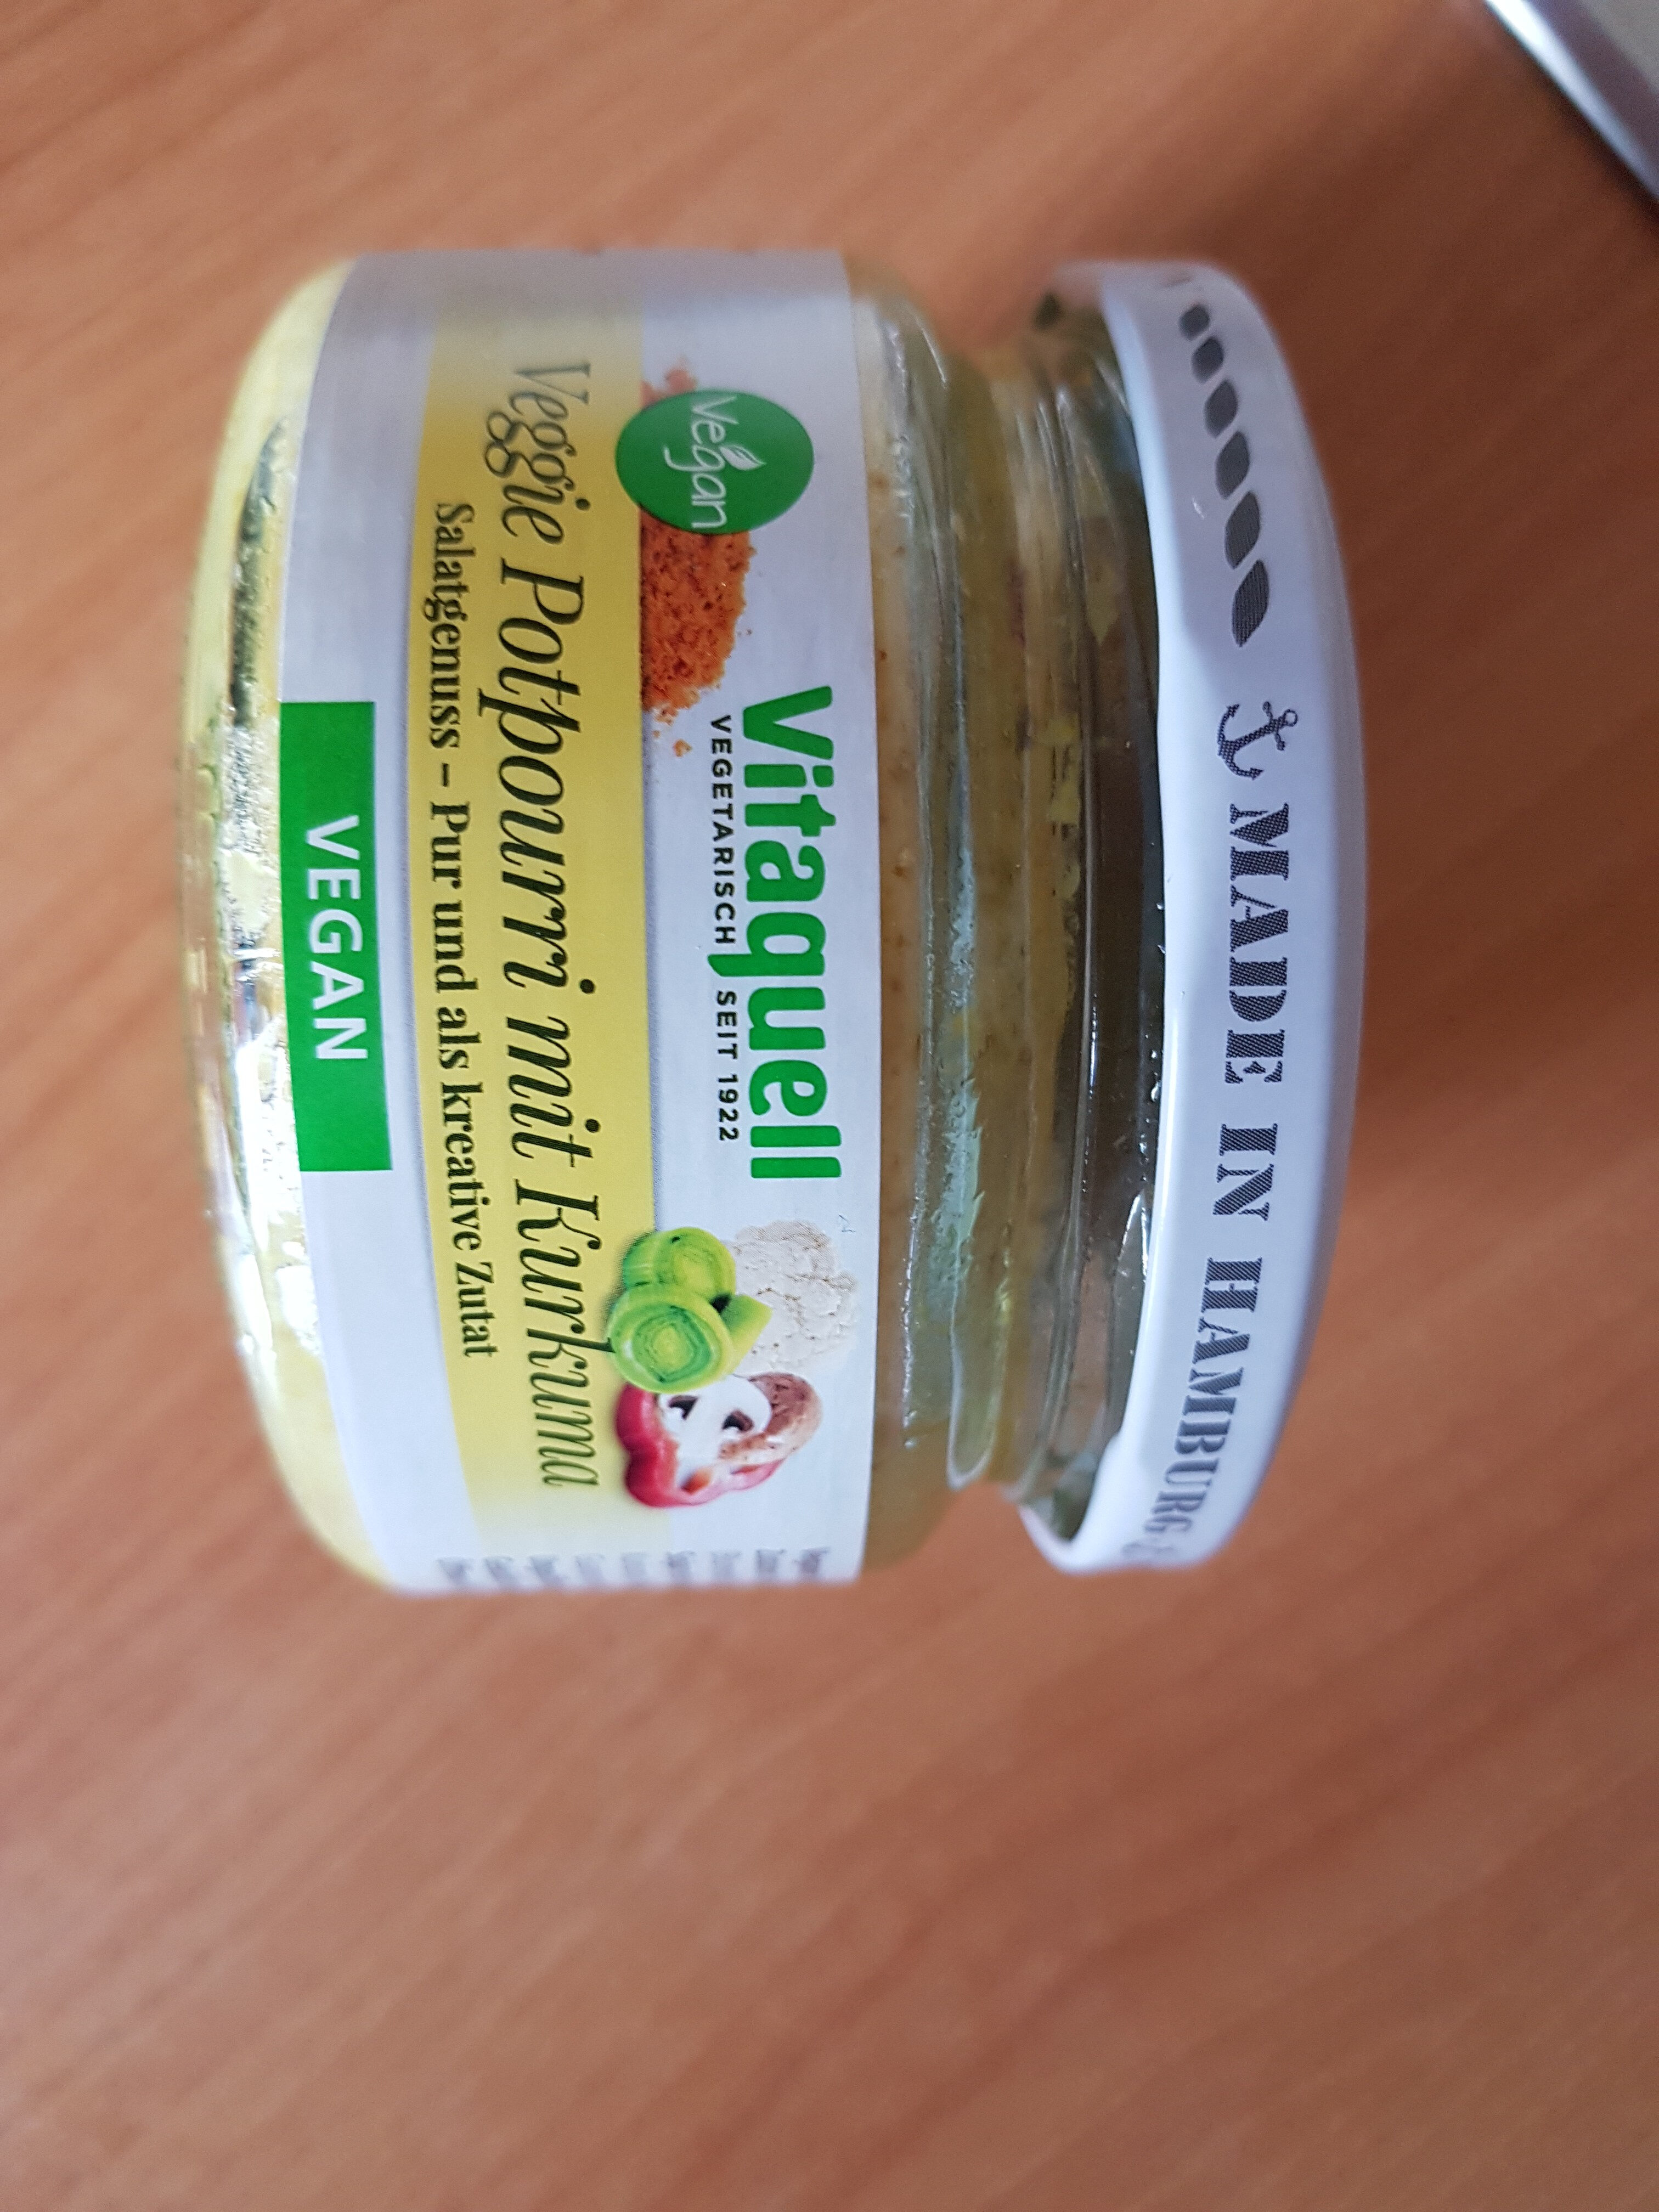 Veggie Potpourri mit Kurkama - Product - de